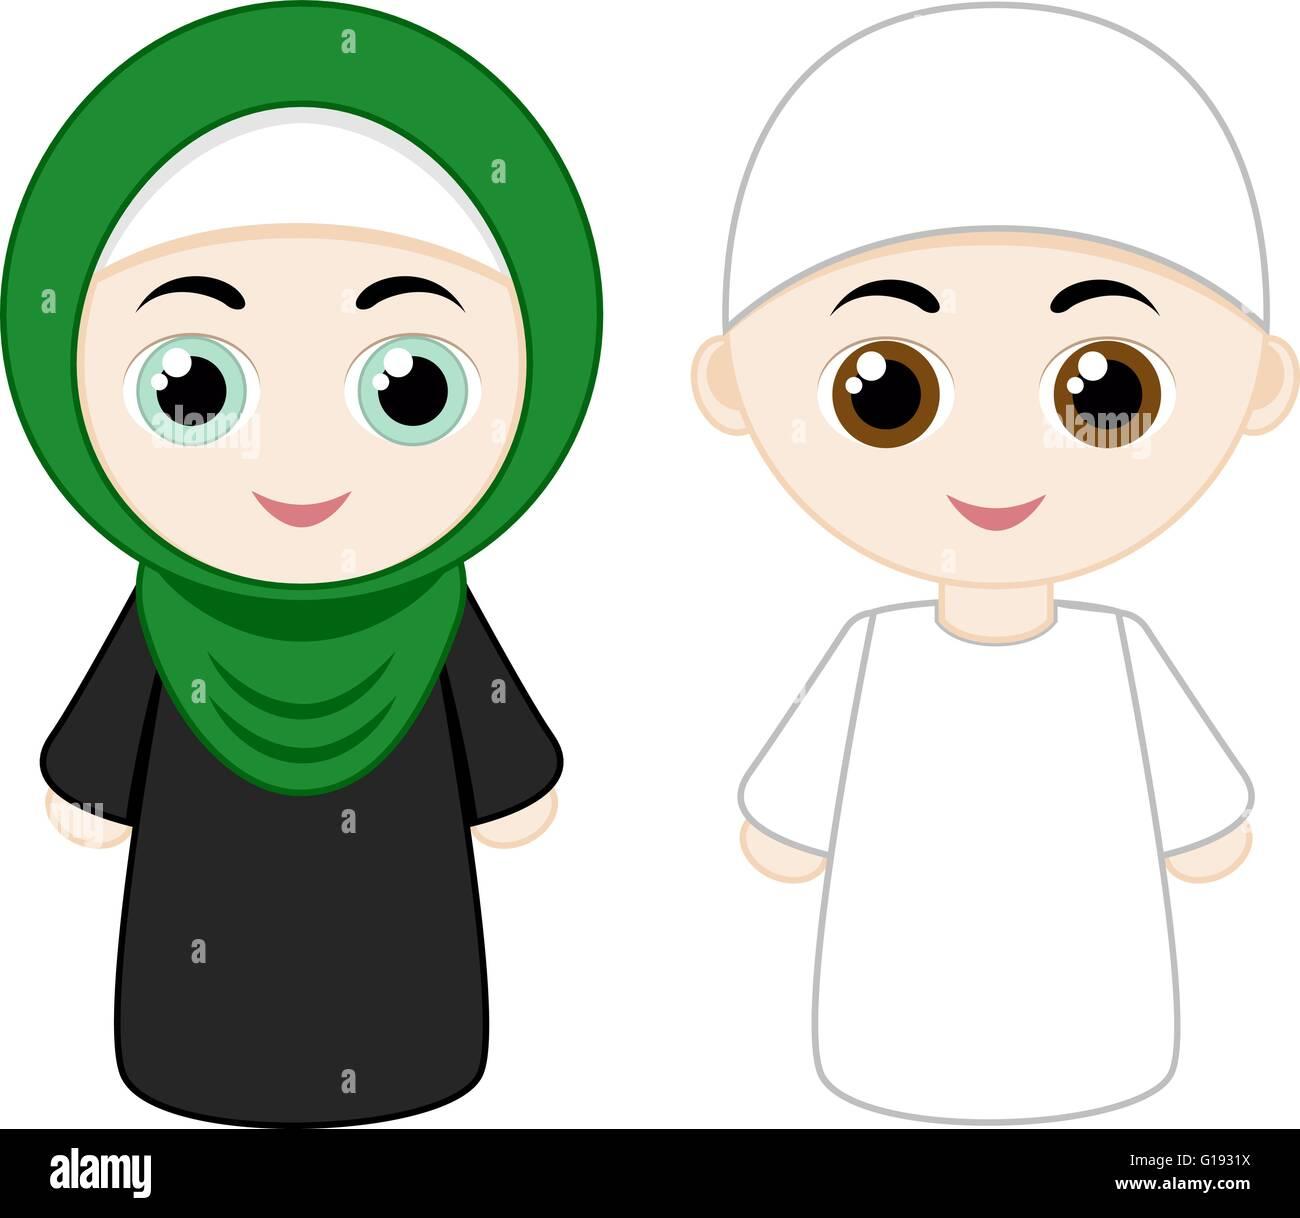 91 Gambar Kartun Islami Laki2 Terbaru Gambar Kantun